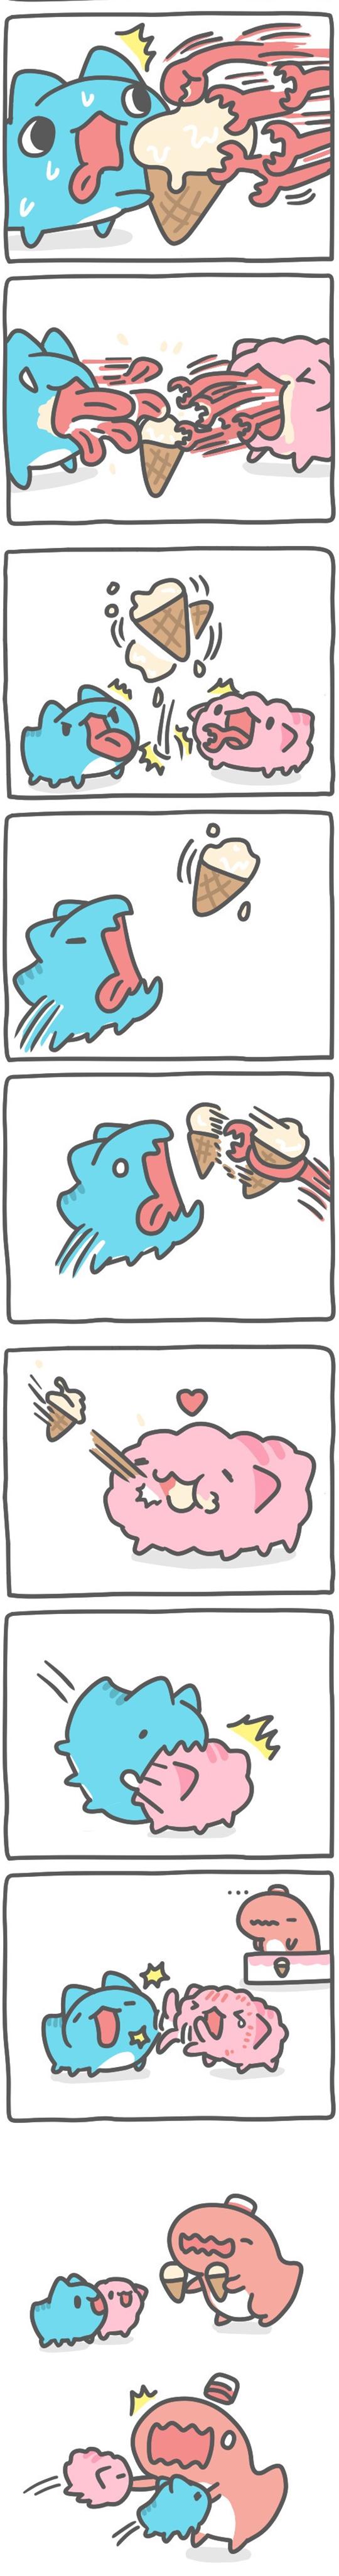 Truyện Mìn Lèo #432: Ăn kem